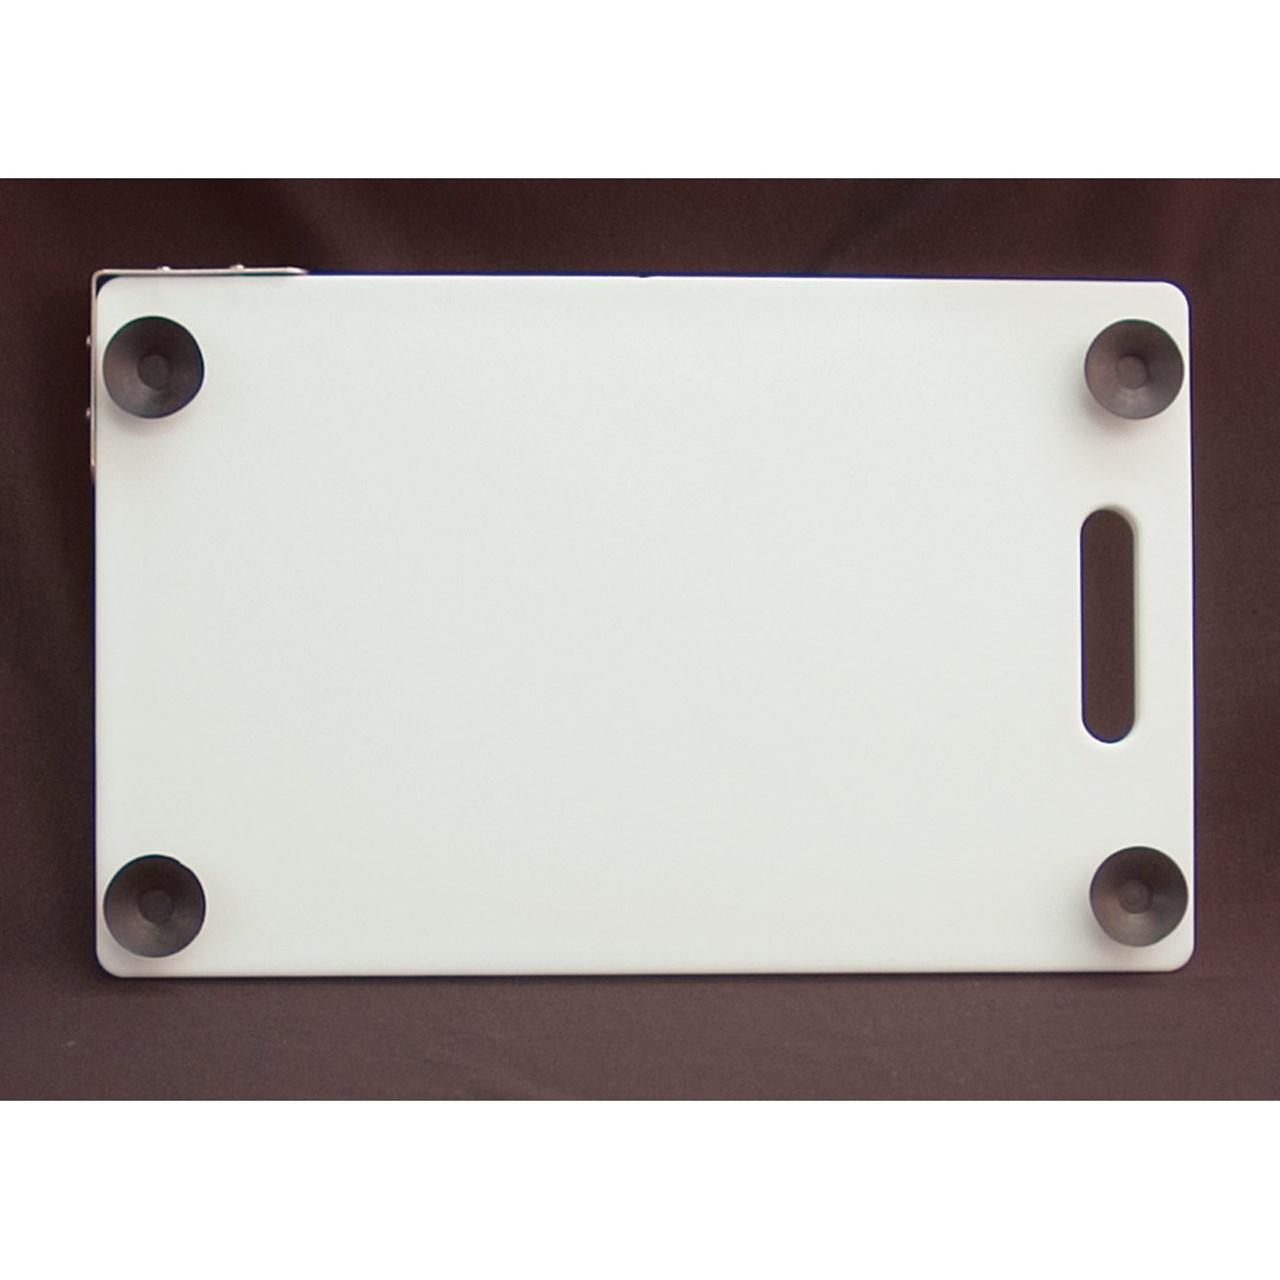 MaxiAids   Reizen E Z Grip Low Vision Cutting Board - White